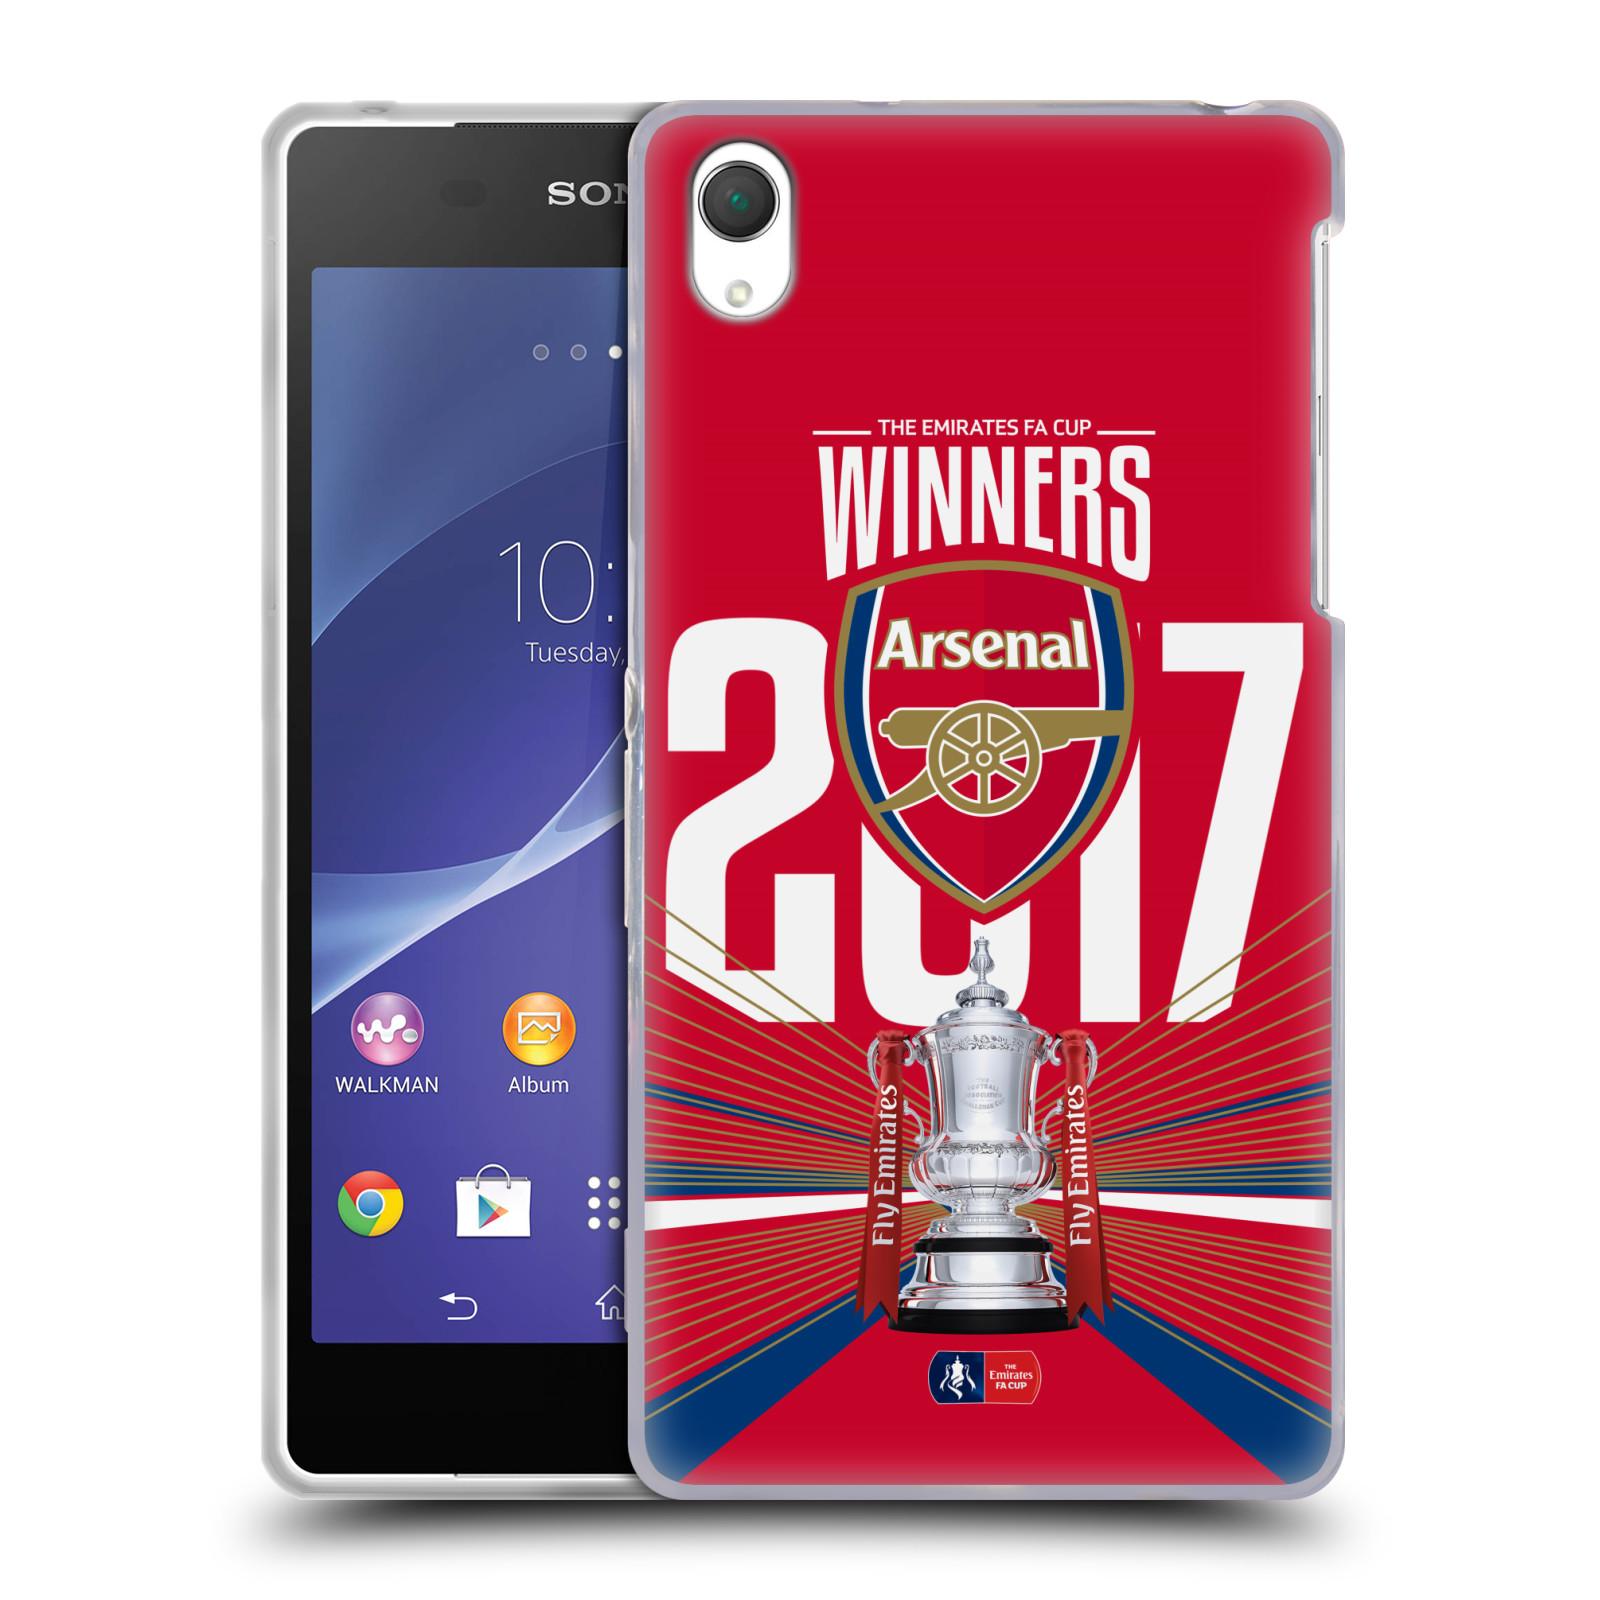 Silikonové pouzdro na mobil Sony Xperia Z2 D6503 - Head Case - Arsenal FC - Trophy